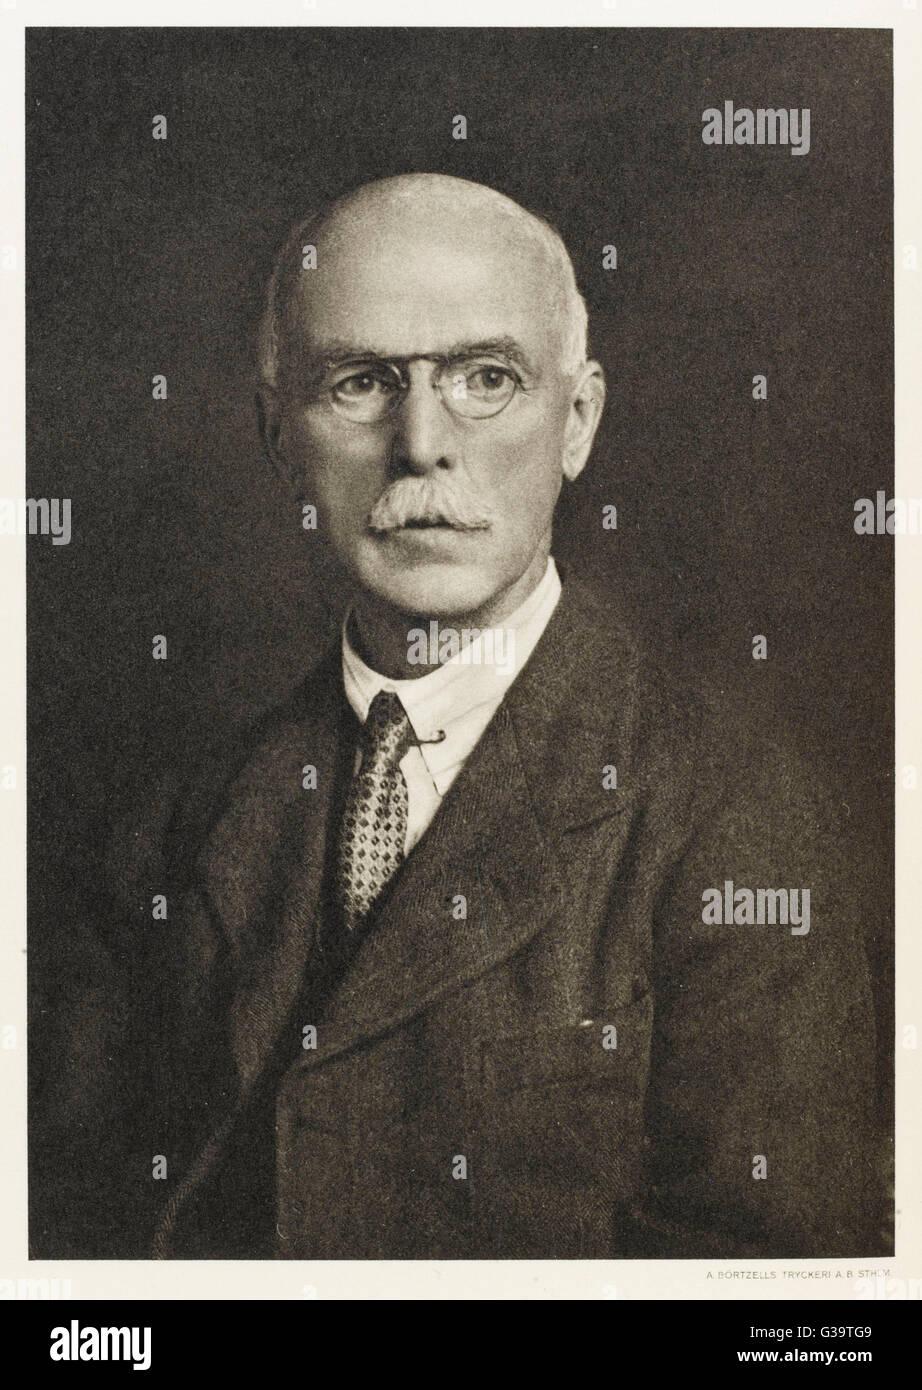 SIR ARTHUR HARDEN  English chemist        Date: 1865 - 1940 - Stock Image